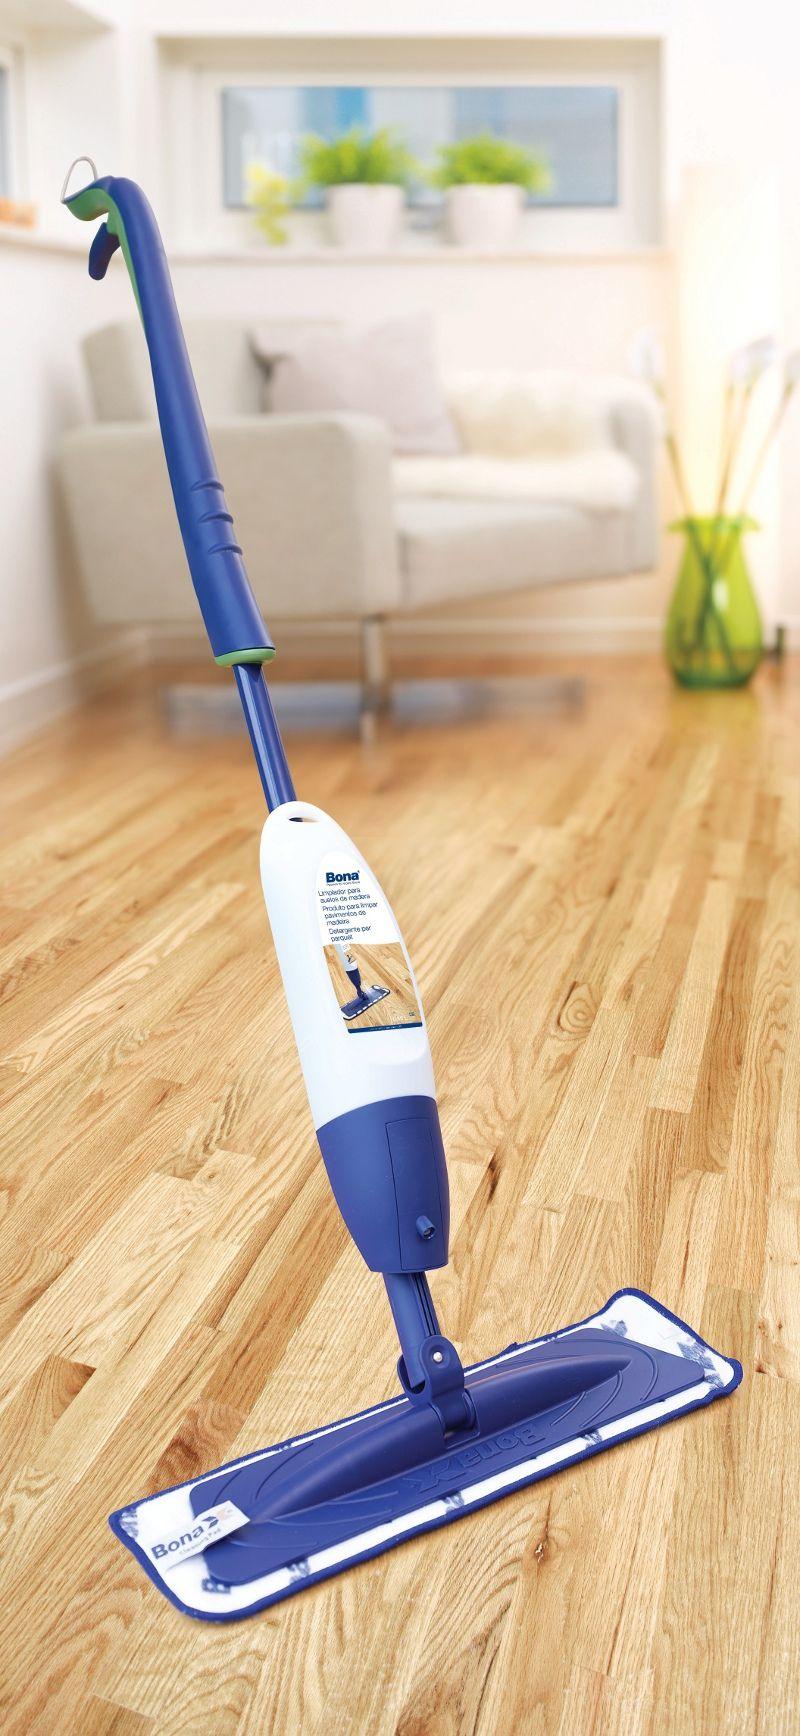 Wood Protection Product Bona Spray Mop By Bona